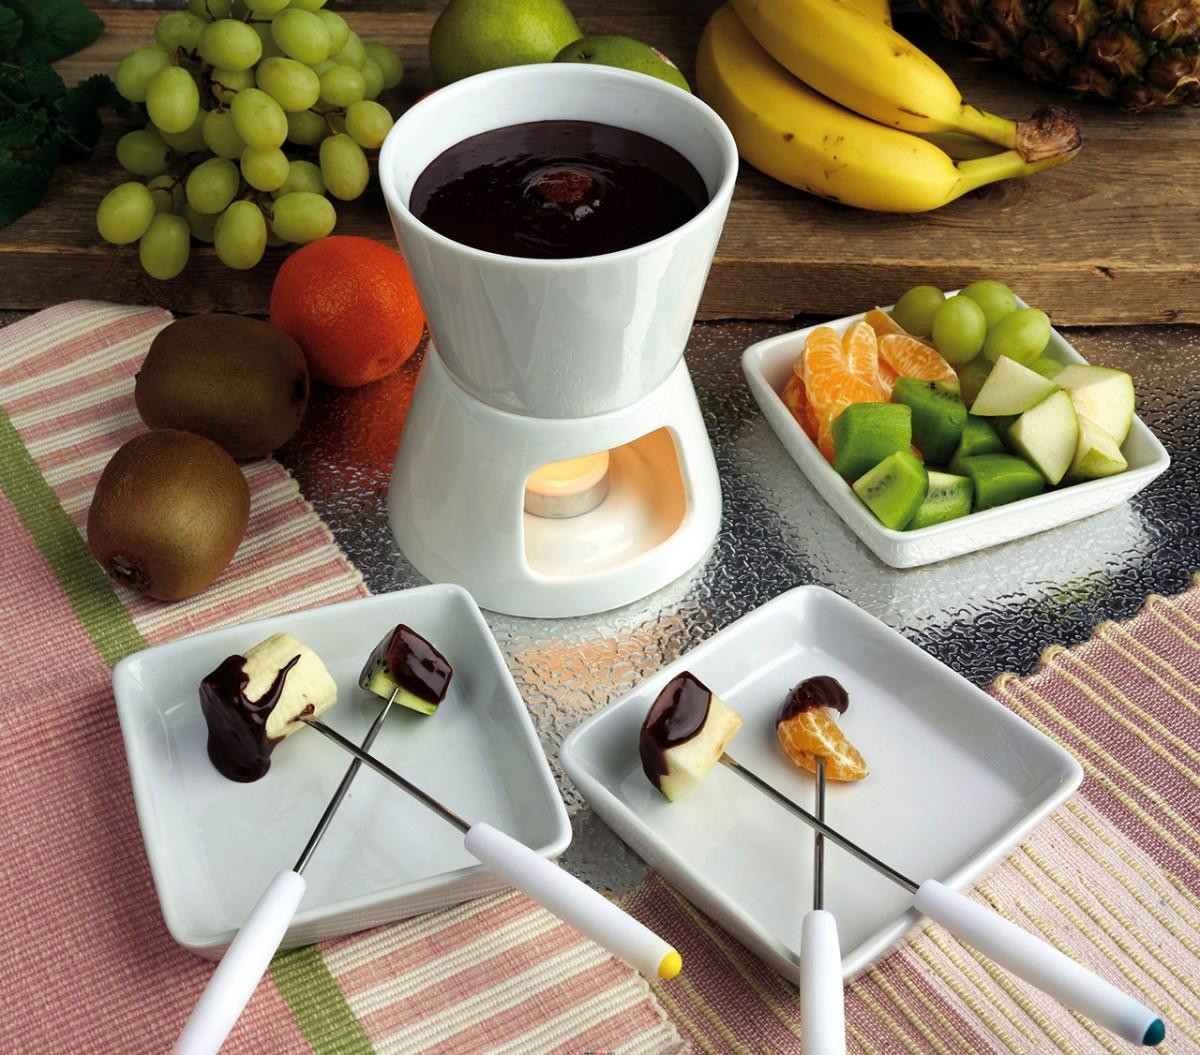 Rompecabezas Recoger rompecabezas en línea - An invitation to a fondue